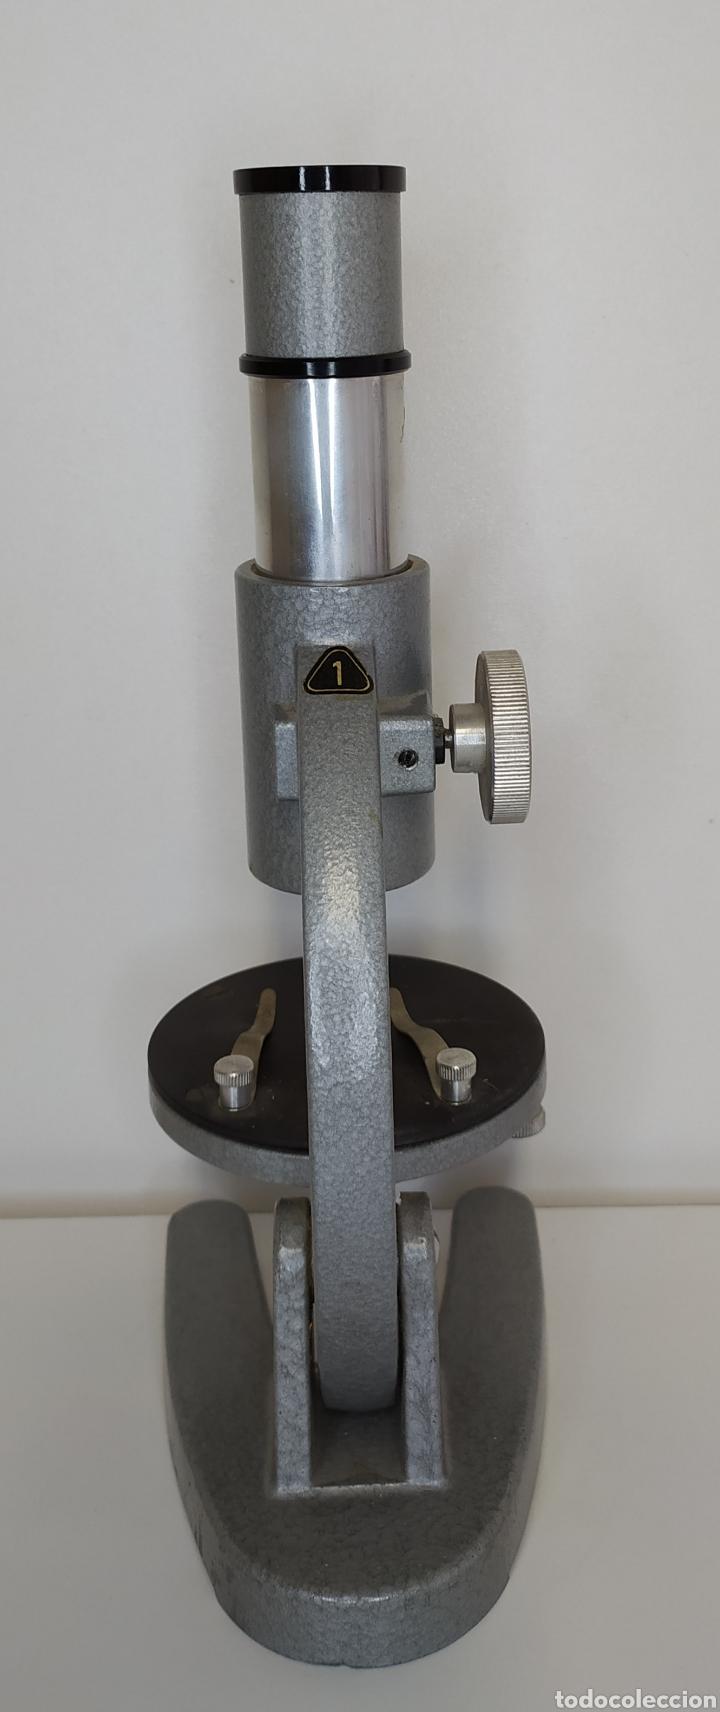 Antigüedades: Antiguo microscopio aleman HF . Escolar - Foto 2 - 260387155